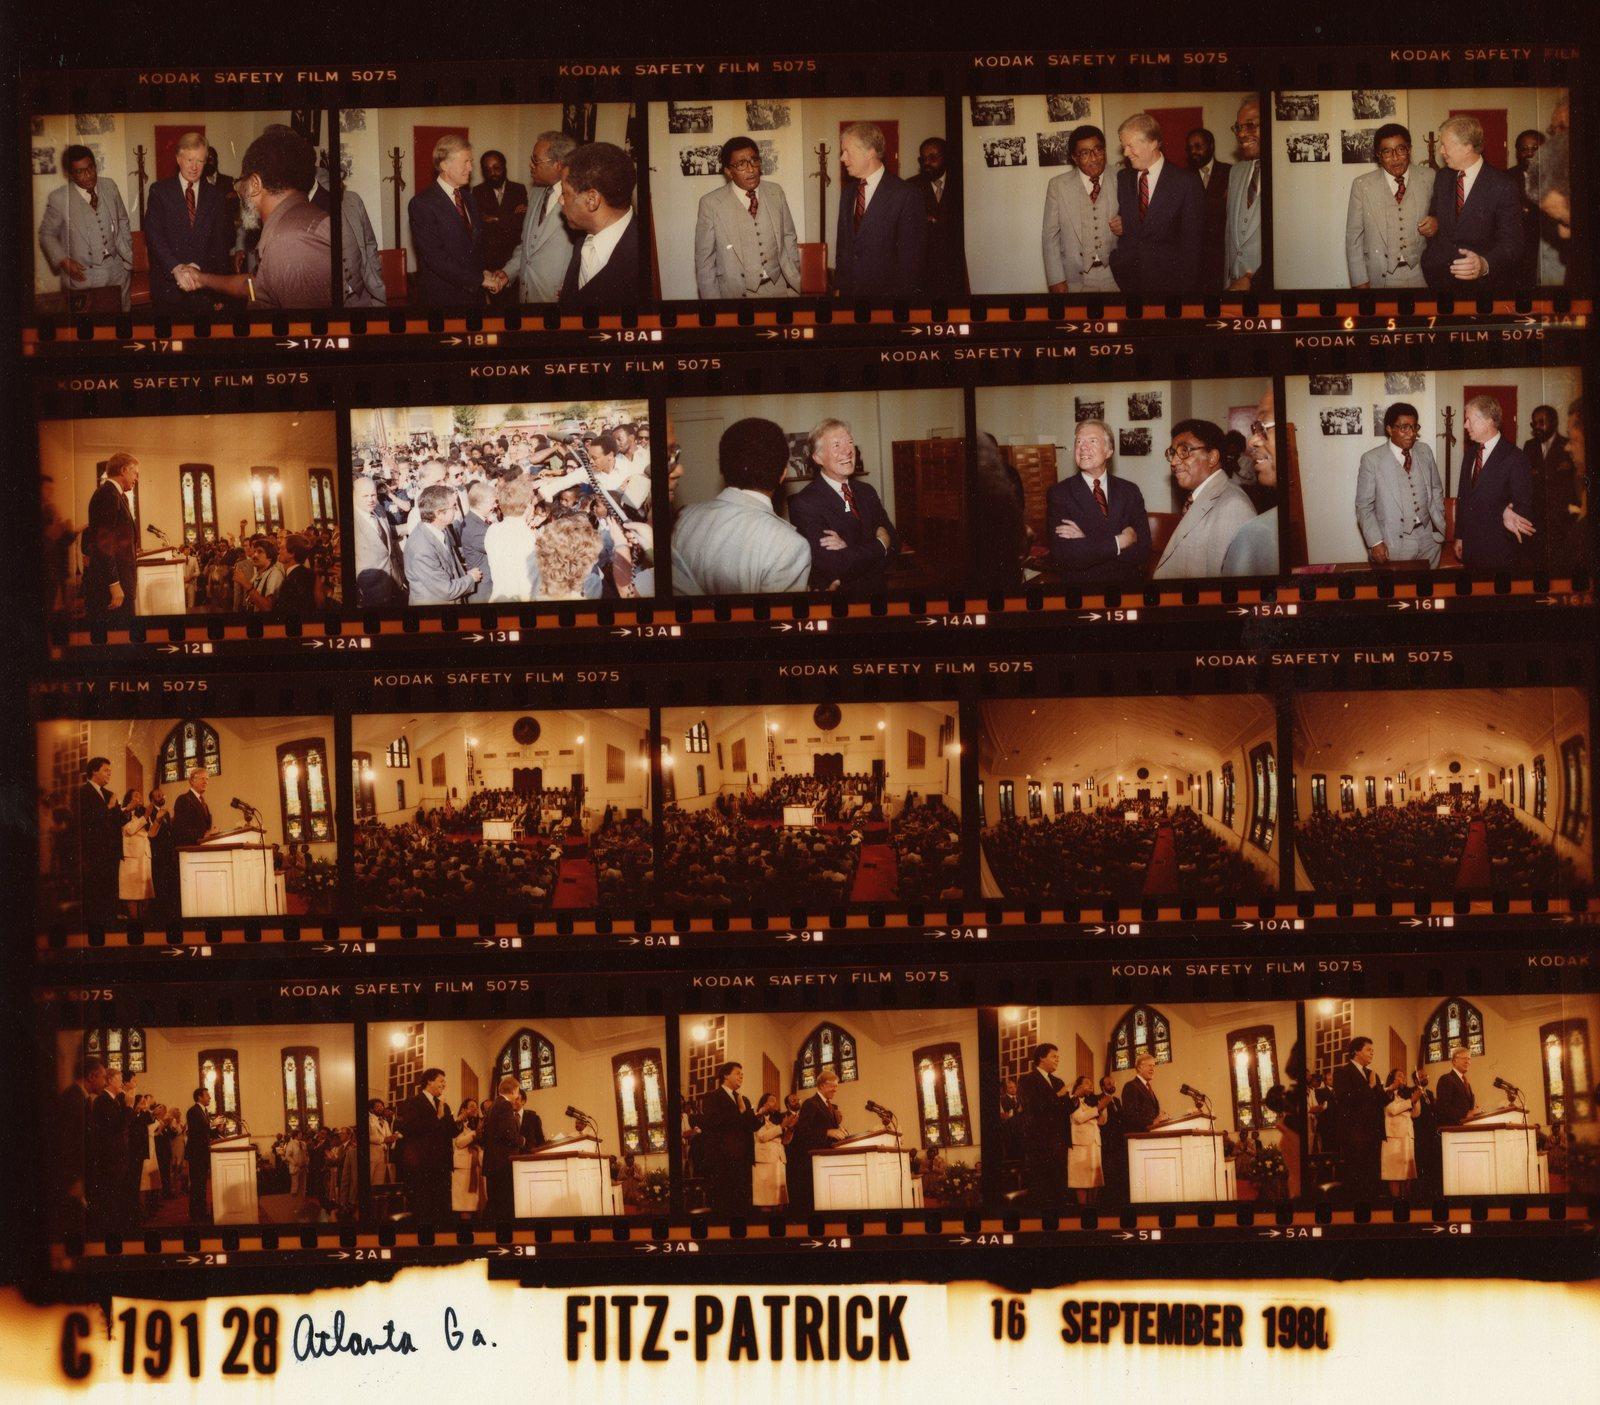 Jimmy Carter -  Atlanta, Georgia at Ebenezer Baptist Church with Andrew Young, Maynard Jackson and Coretta Scott King